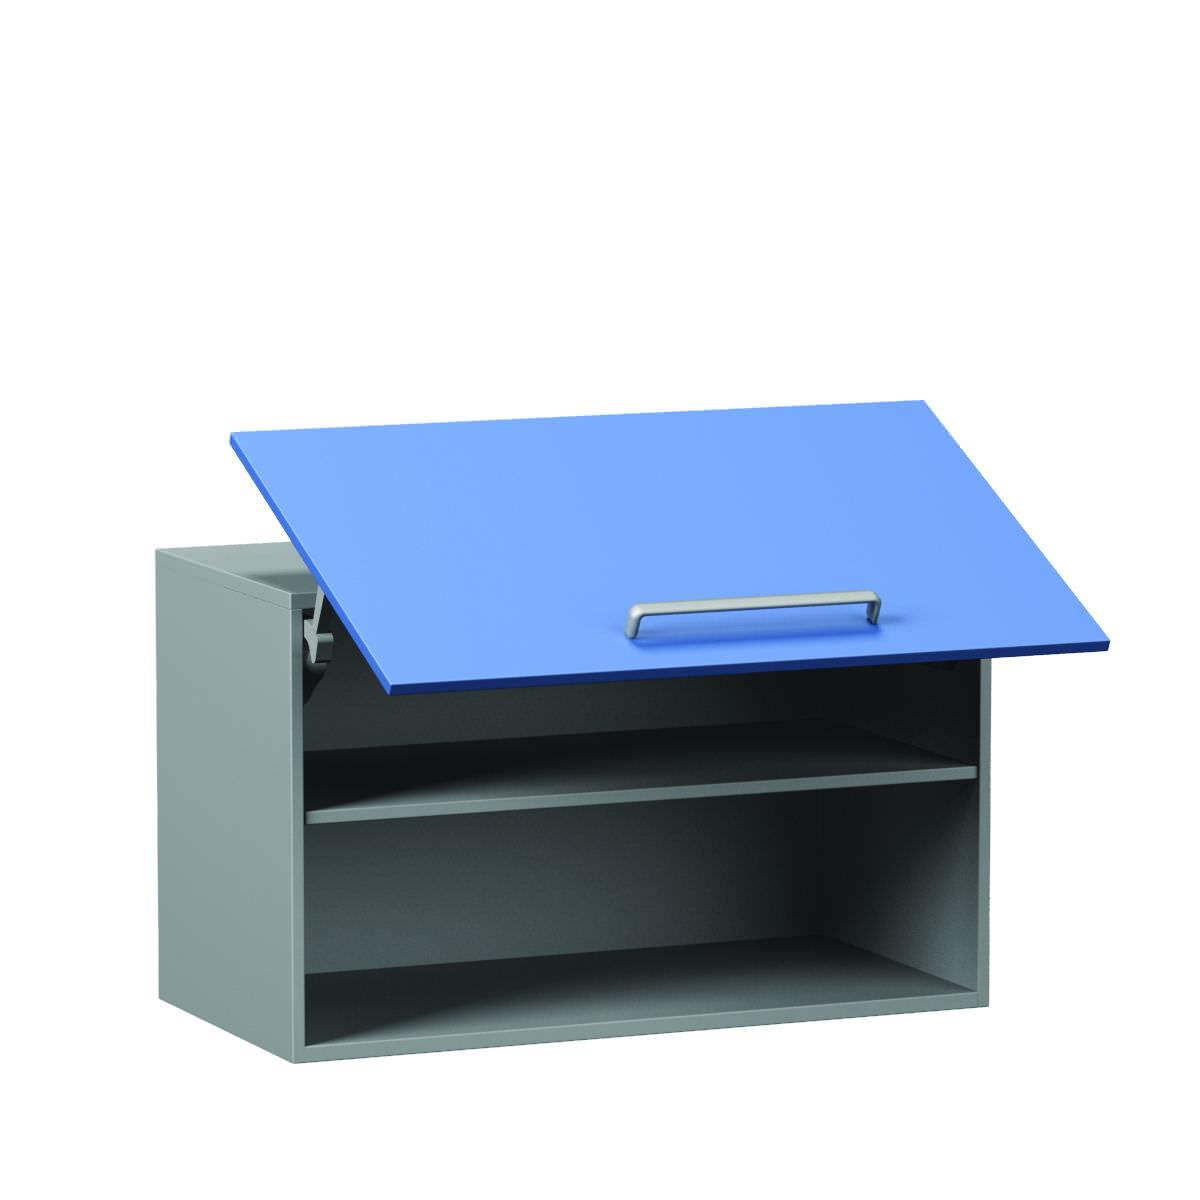 Шкаф навесной ДМ-4-002-15